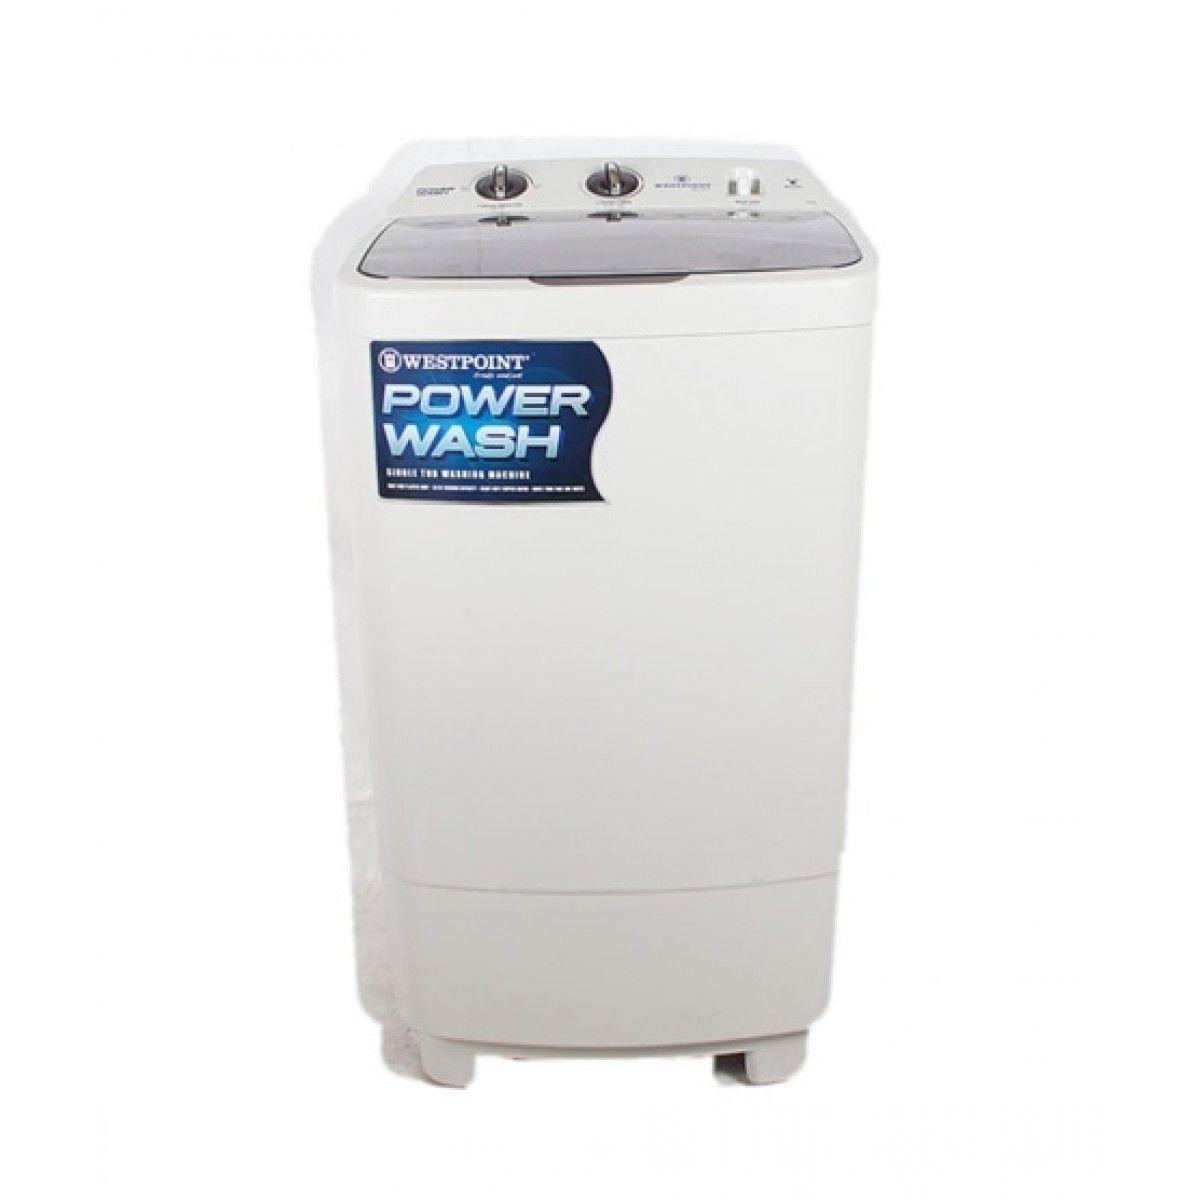 Westpoint (WF-1017-T) Single Tub Transparent Cover 10KG  Washing Machine